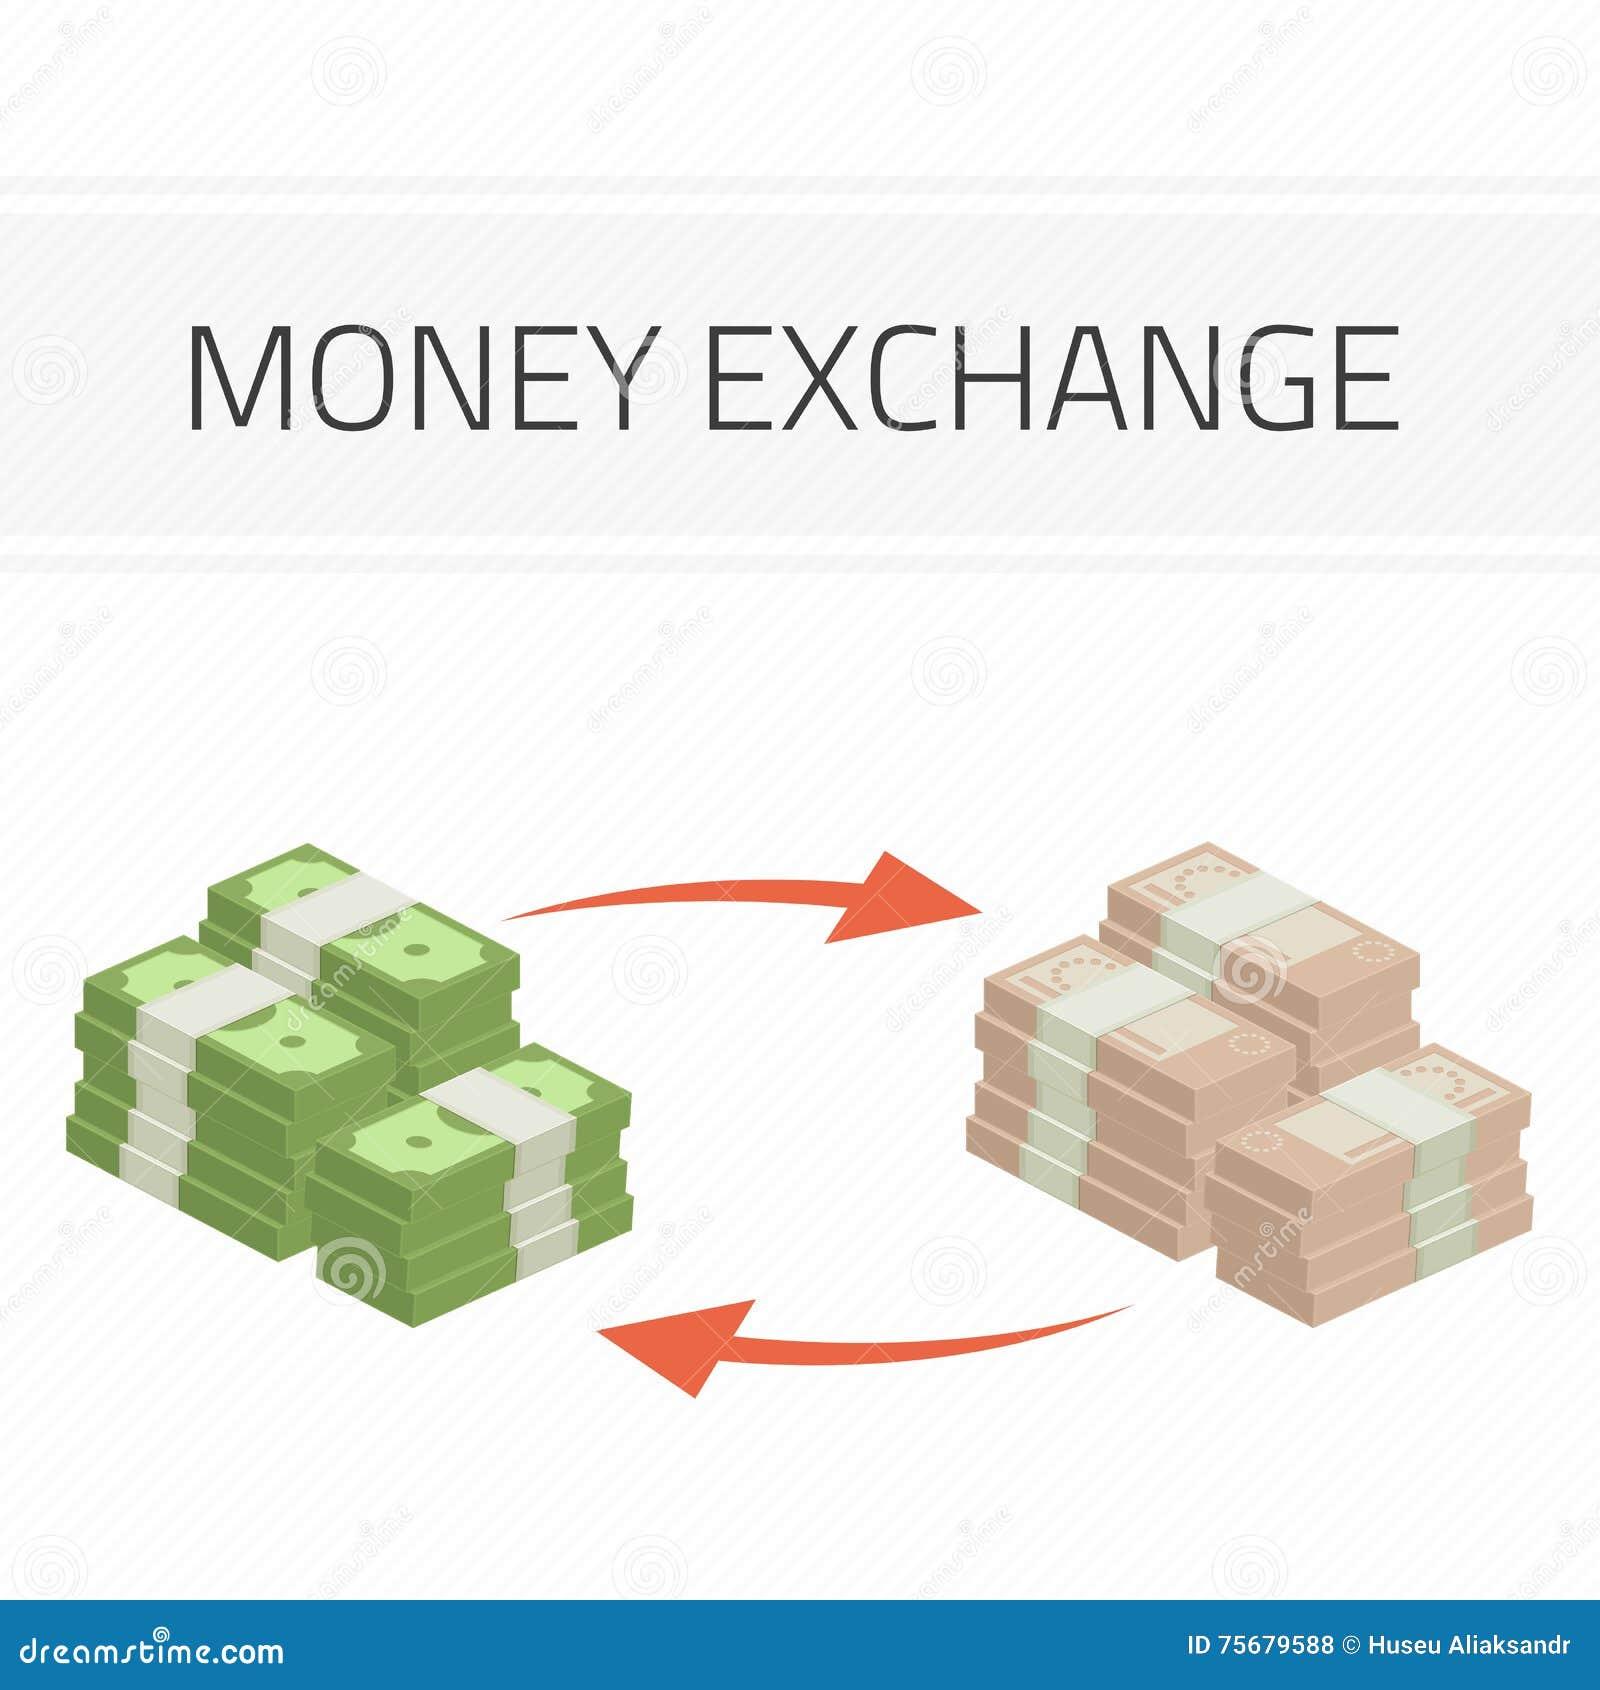 Money Exchange Illustration Stock Vector Illustration Of Flat